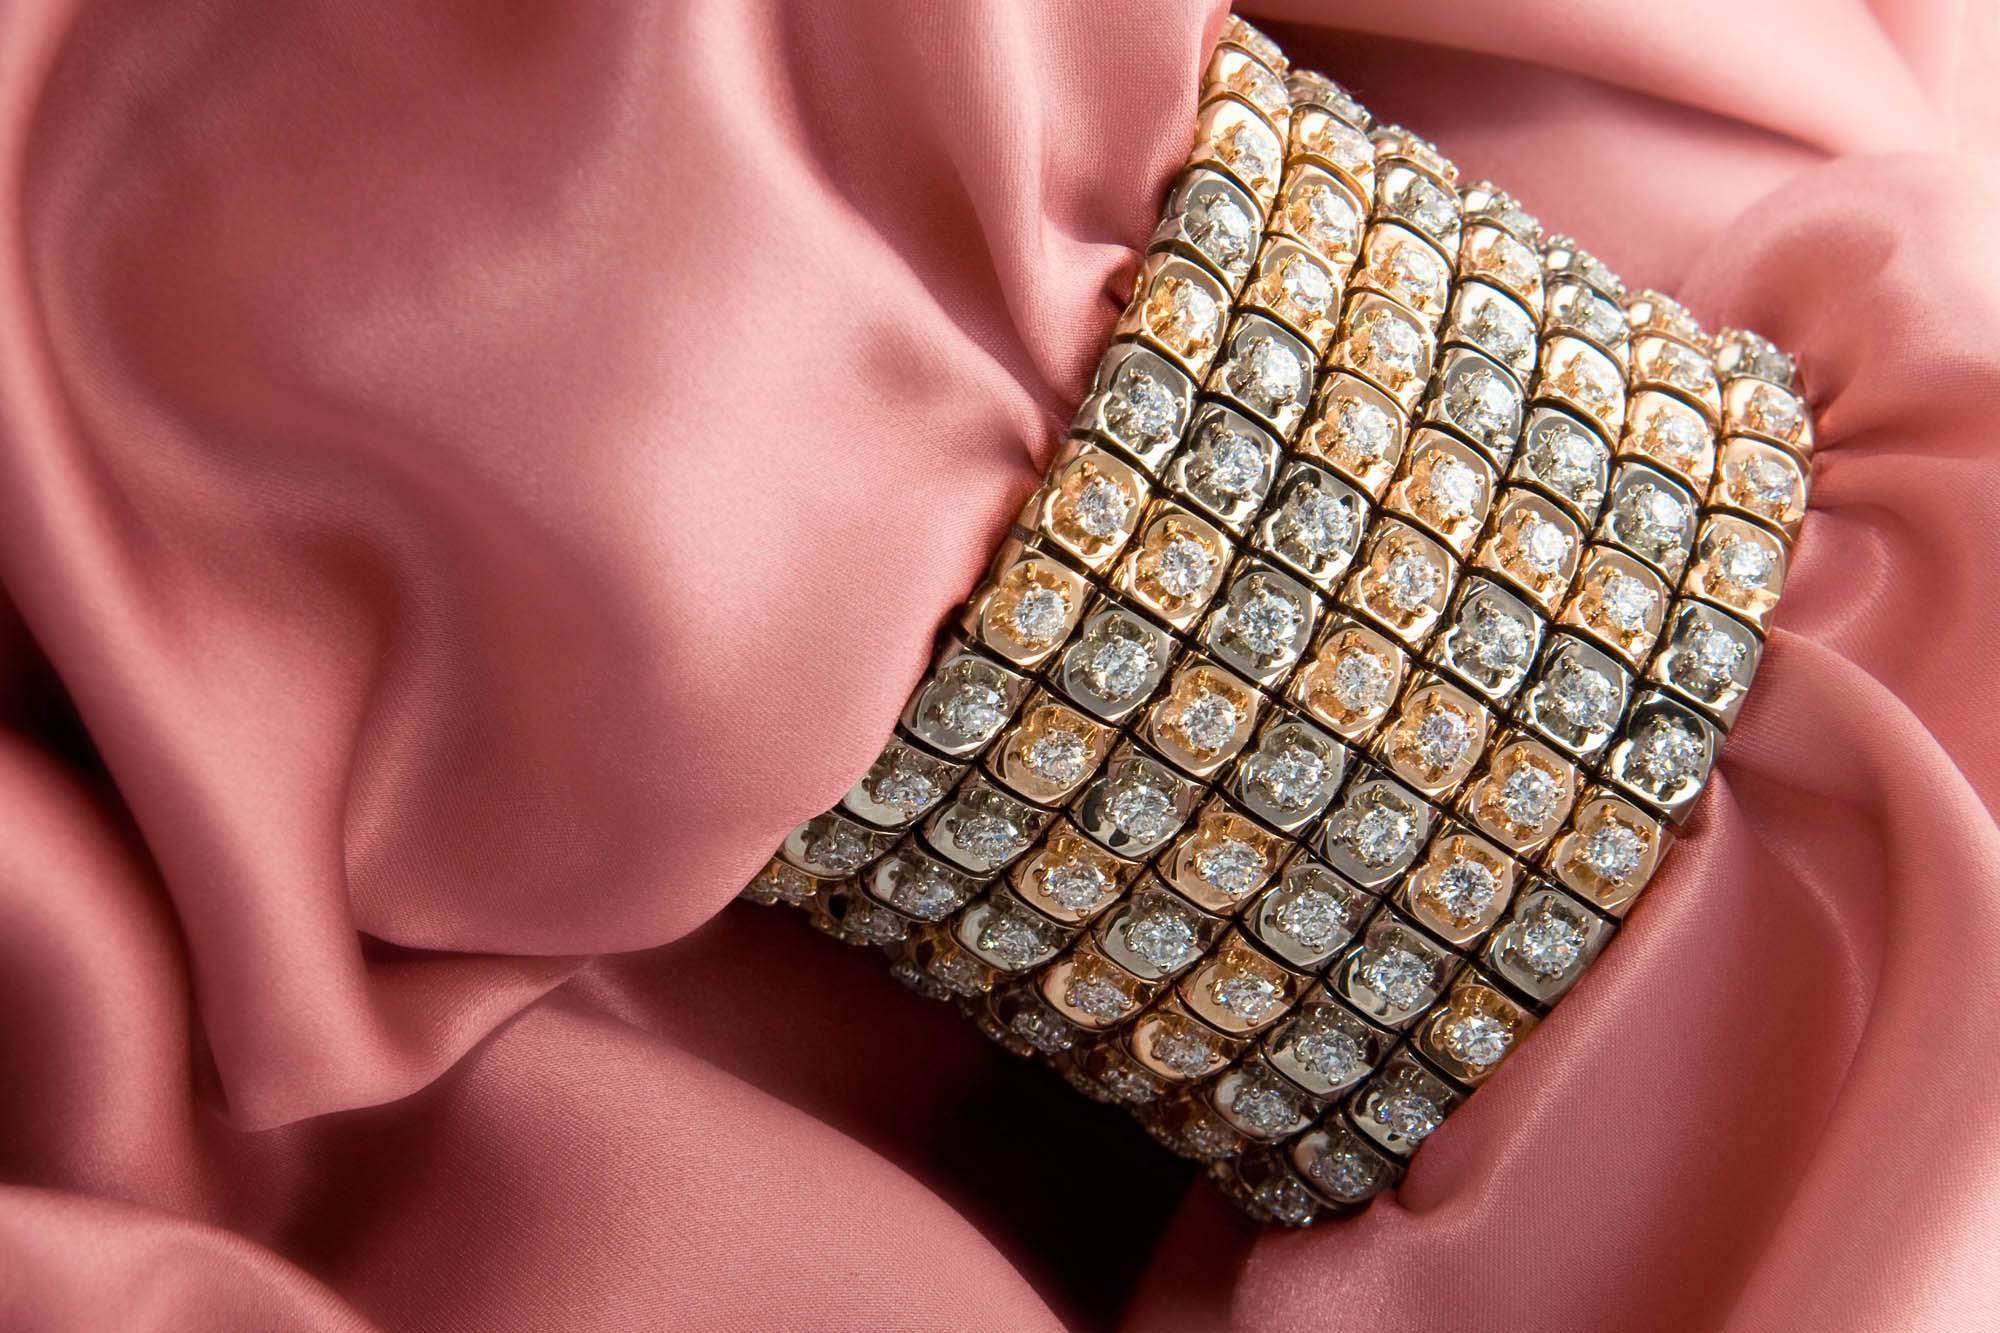 Pluczenik   The name behind diamonds